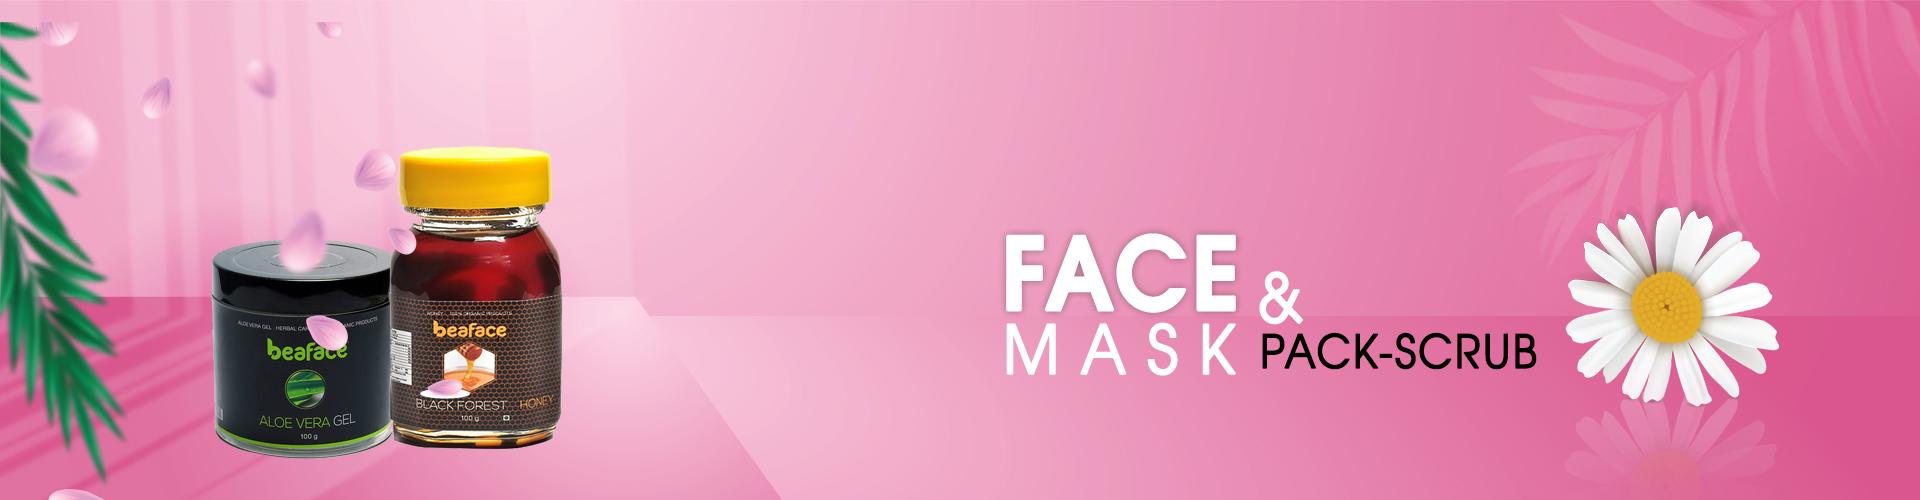 Face mask, Pack & Scrub